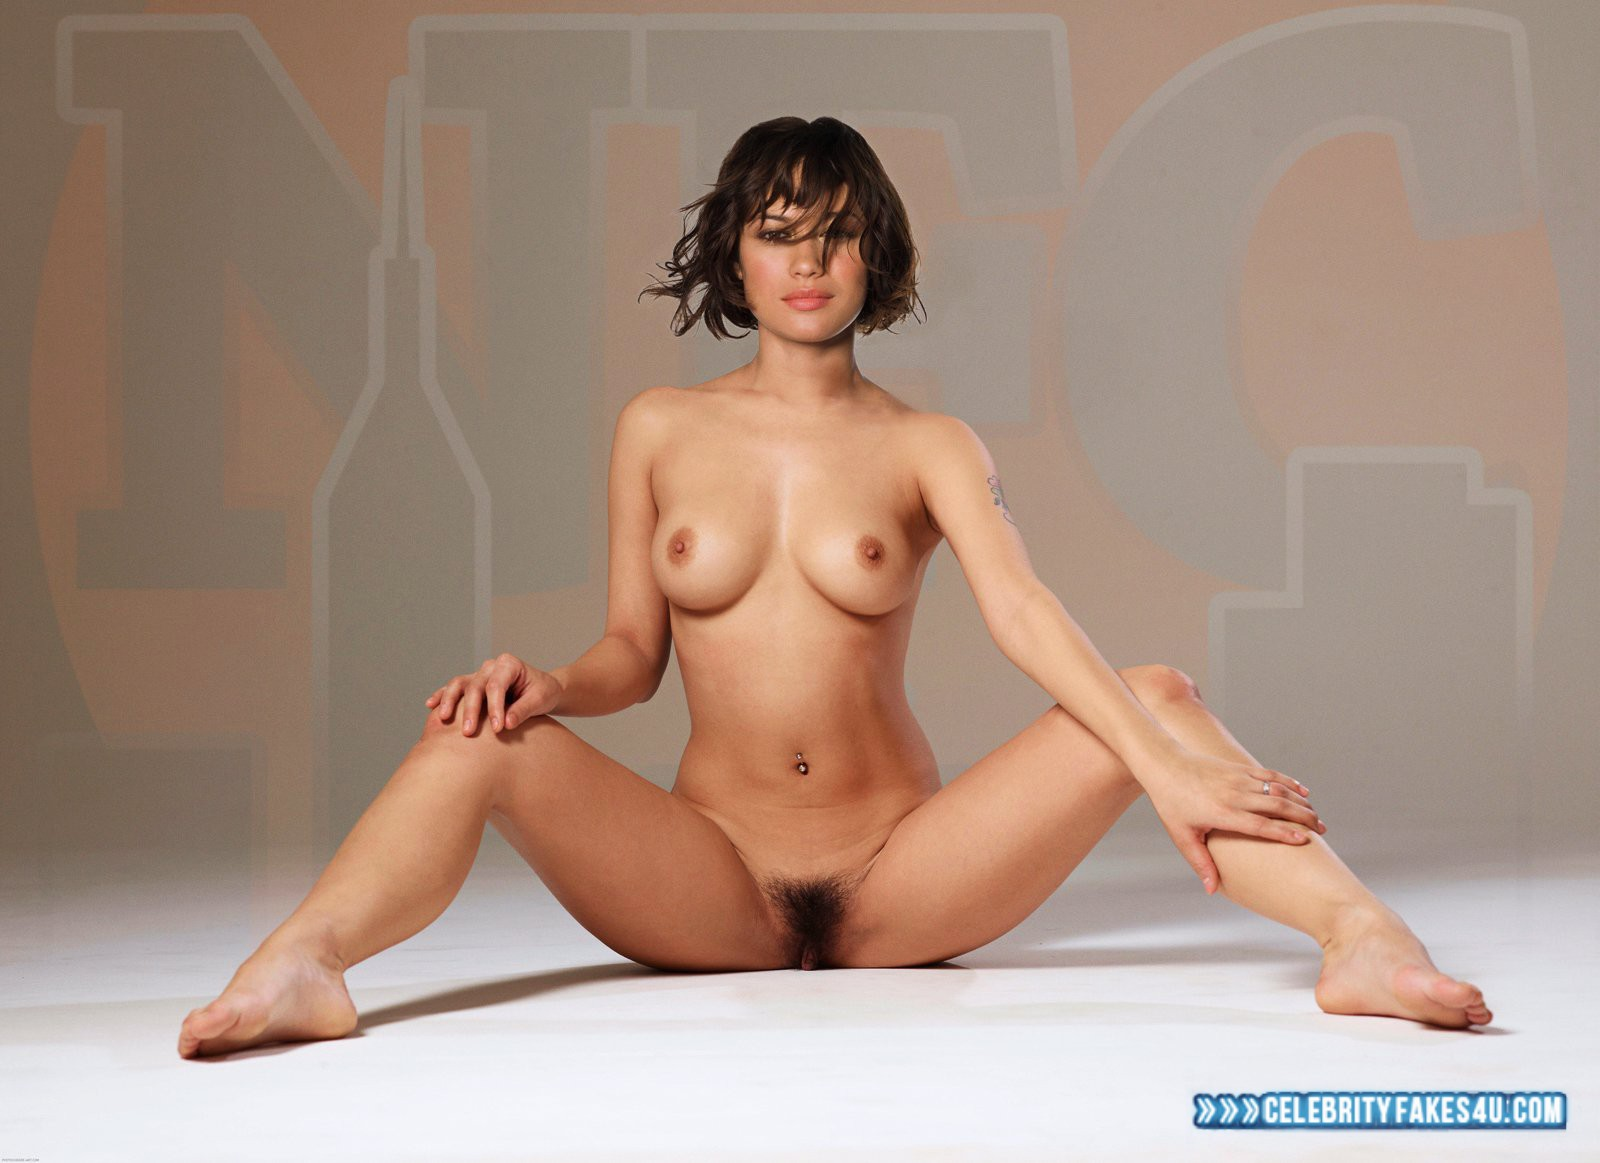 Actriz Porno Olga olga kurylenko hairy legs spread pussy naked 001 | free hot